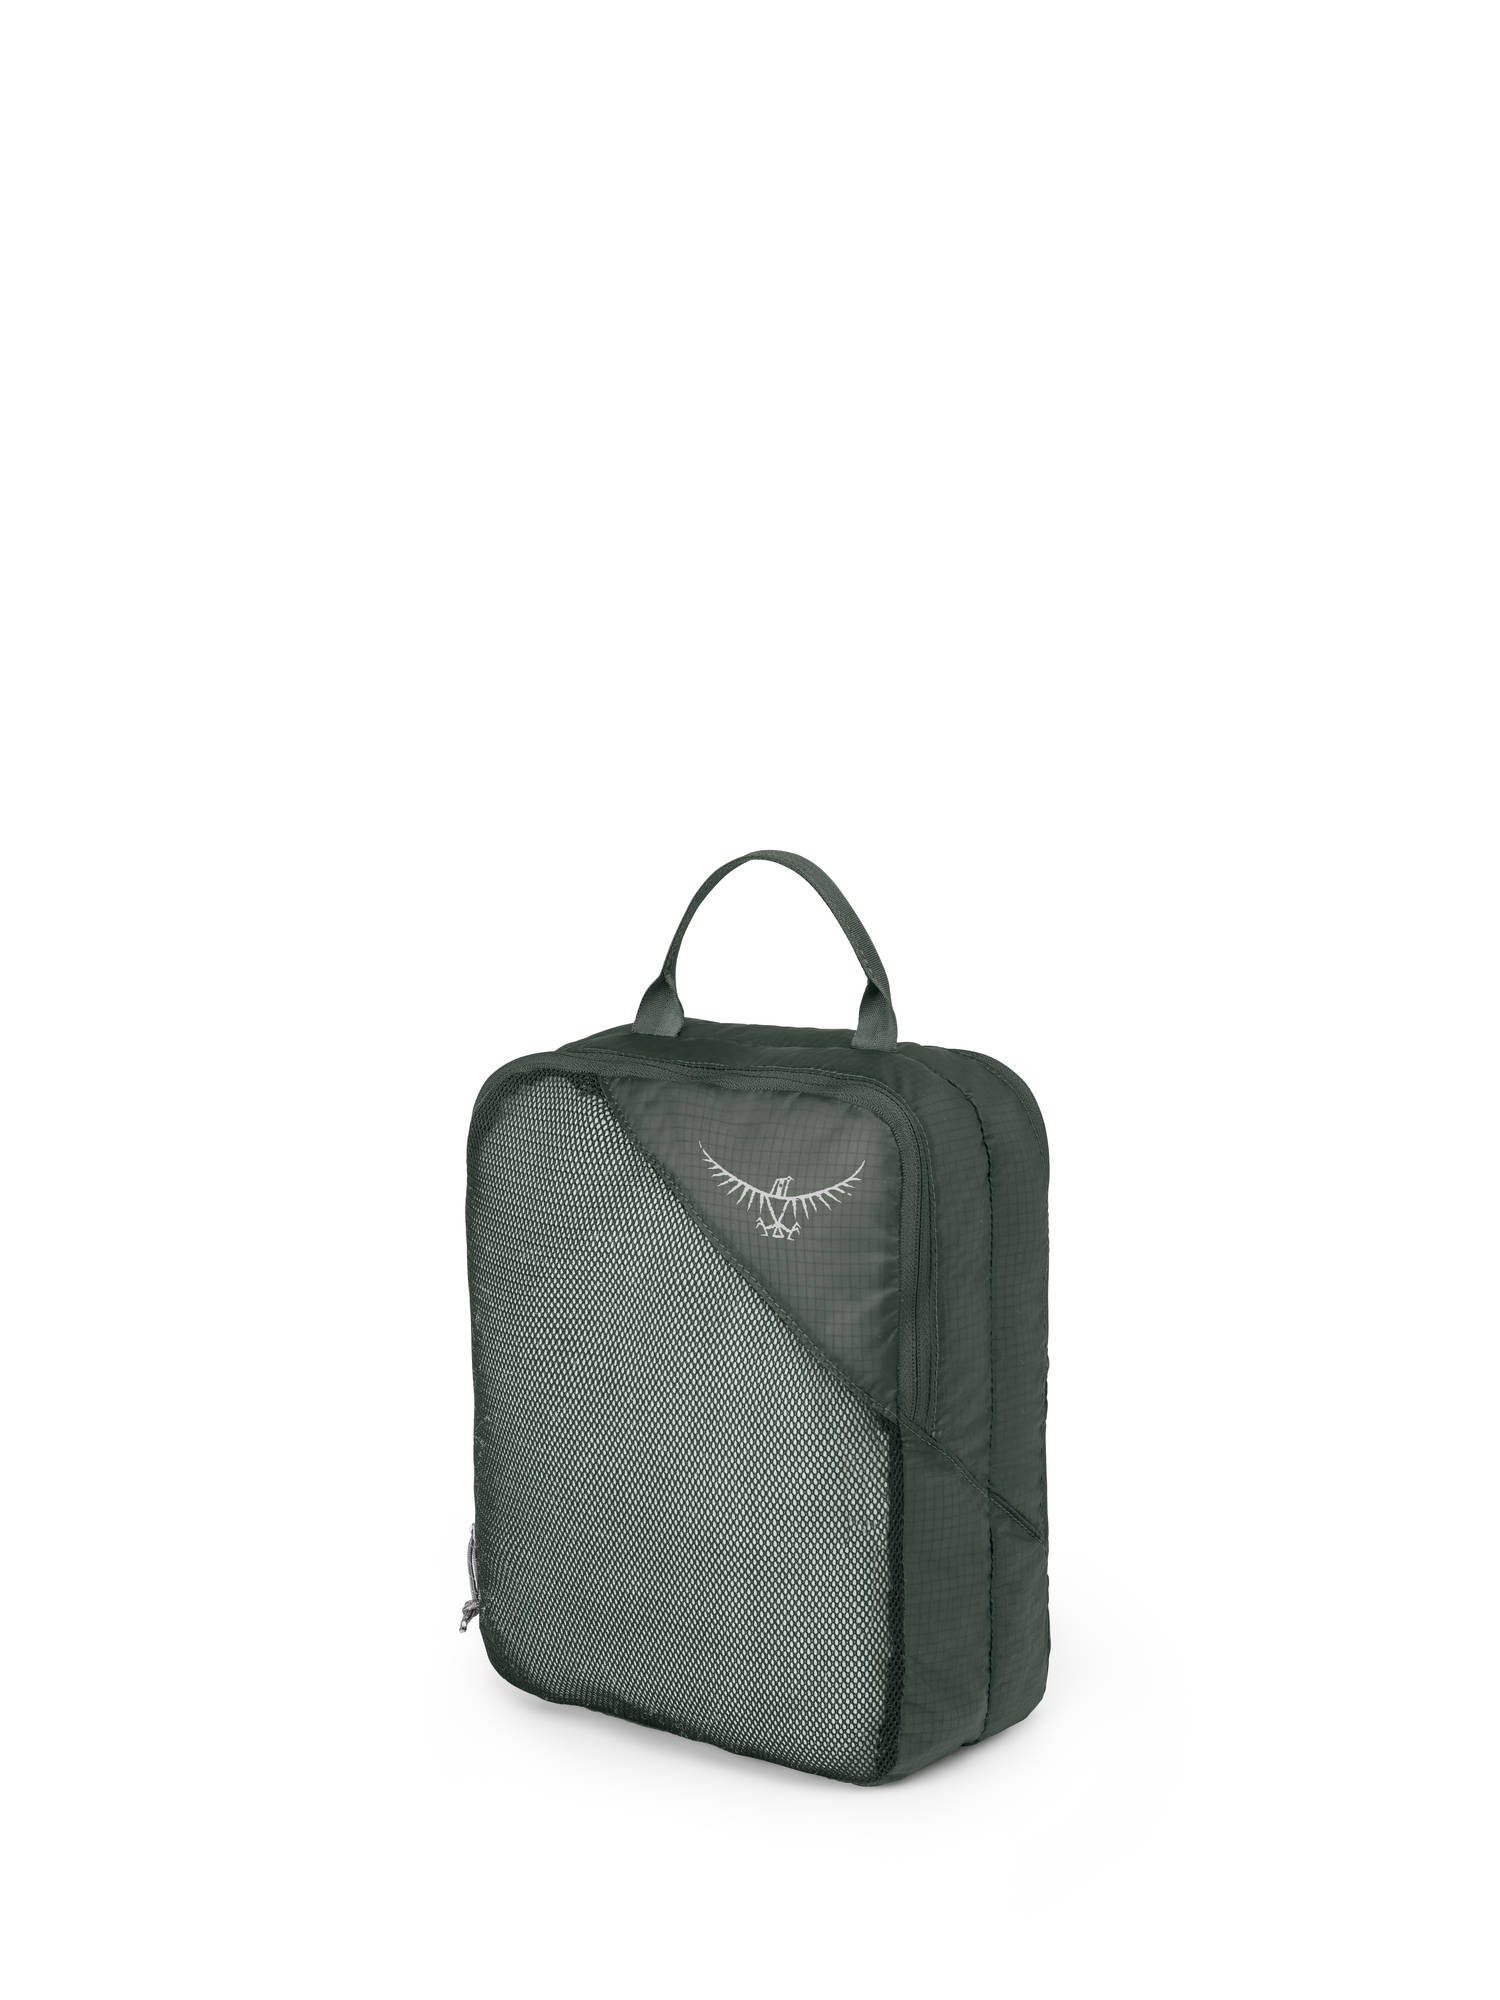 Аксессуары Чехол для одежды Osprey Ultralight Double Sided Cube Medium Shadow Grey UL_Double_Sided_Cube_M_F17_Side_Shadow_Grey_web.jpg